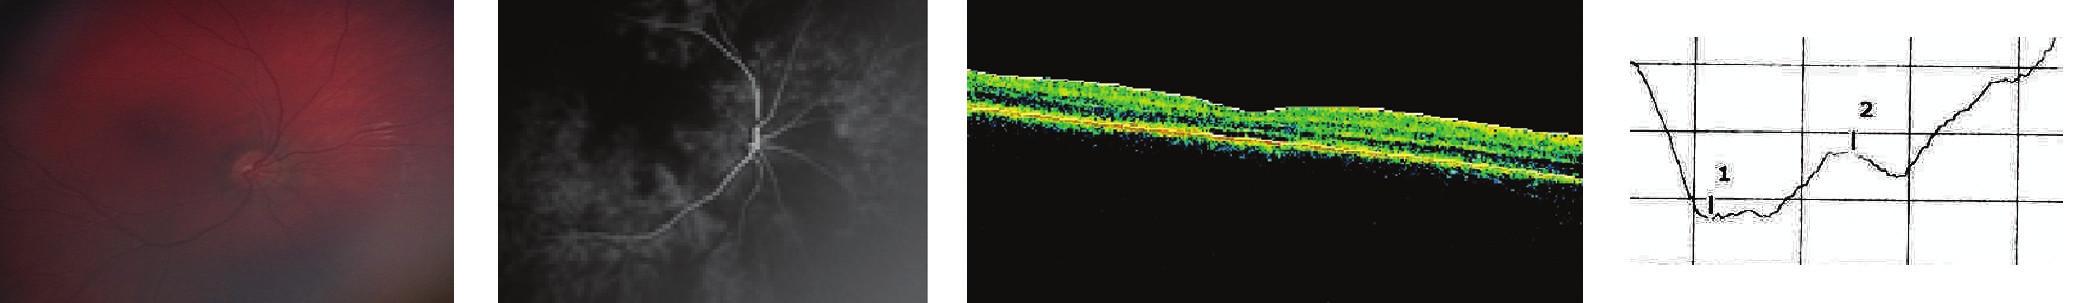 Totálna achromatopsia 3a Oftalmoskopický nález, 3b Nález na FAG, 3c Obraz OCT, 3d Fotopický záznam ERG